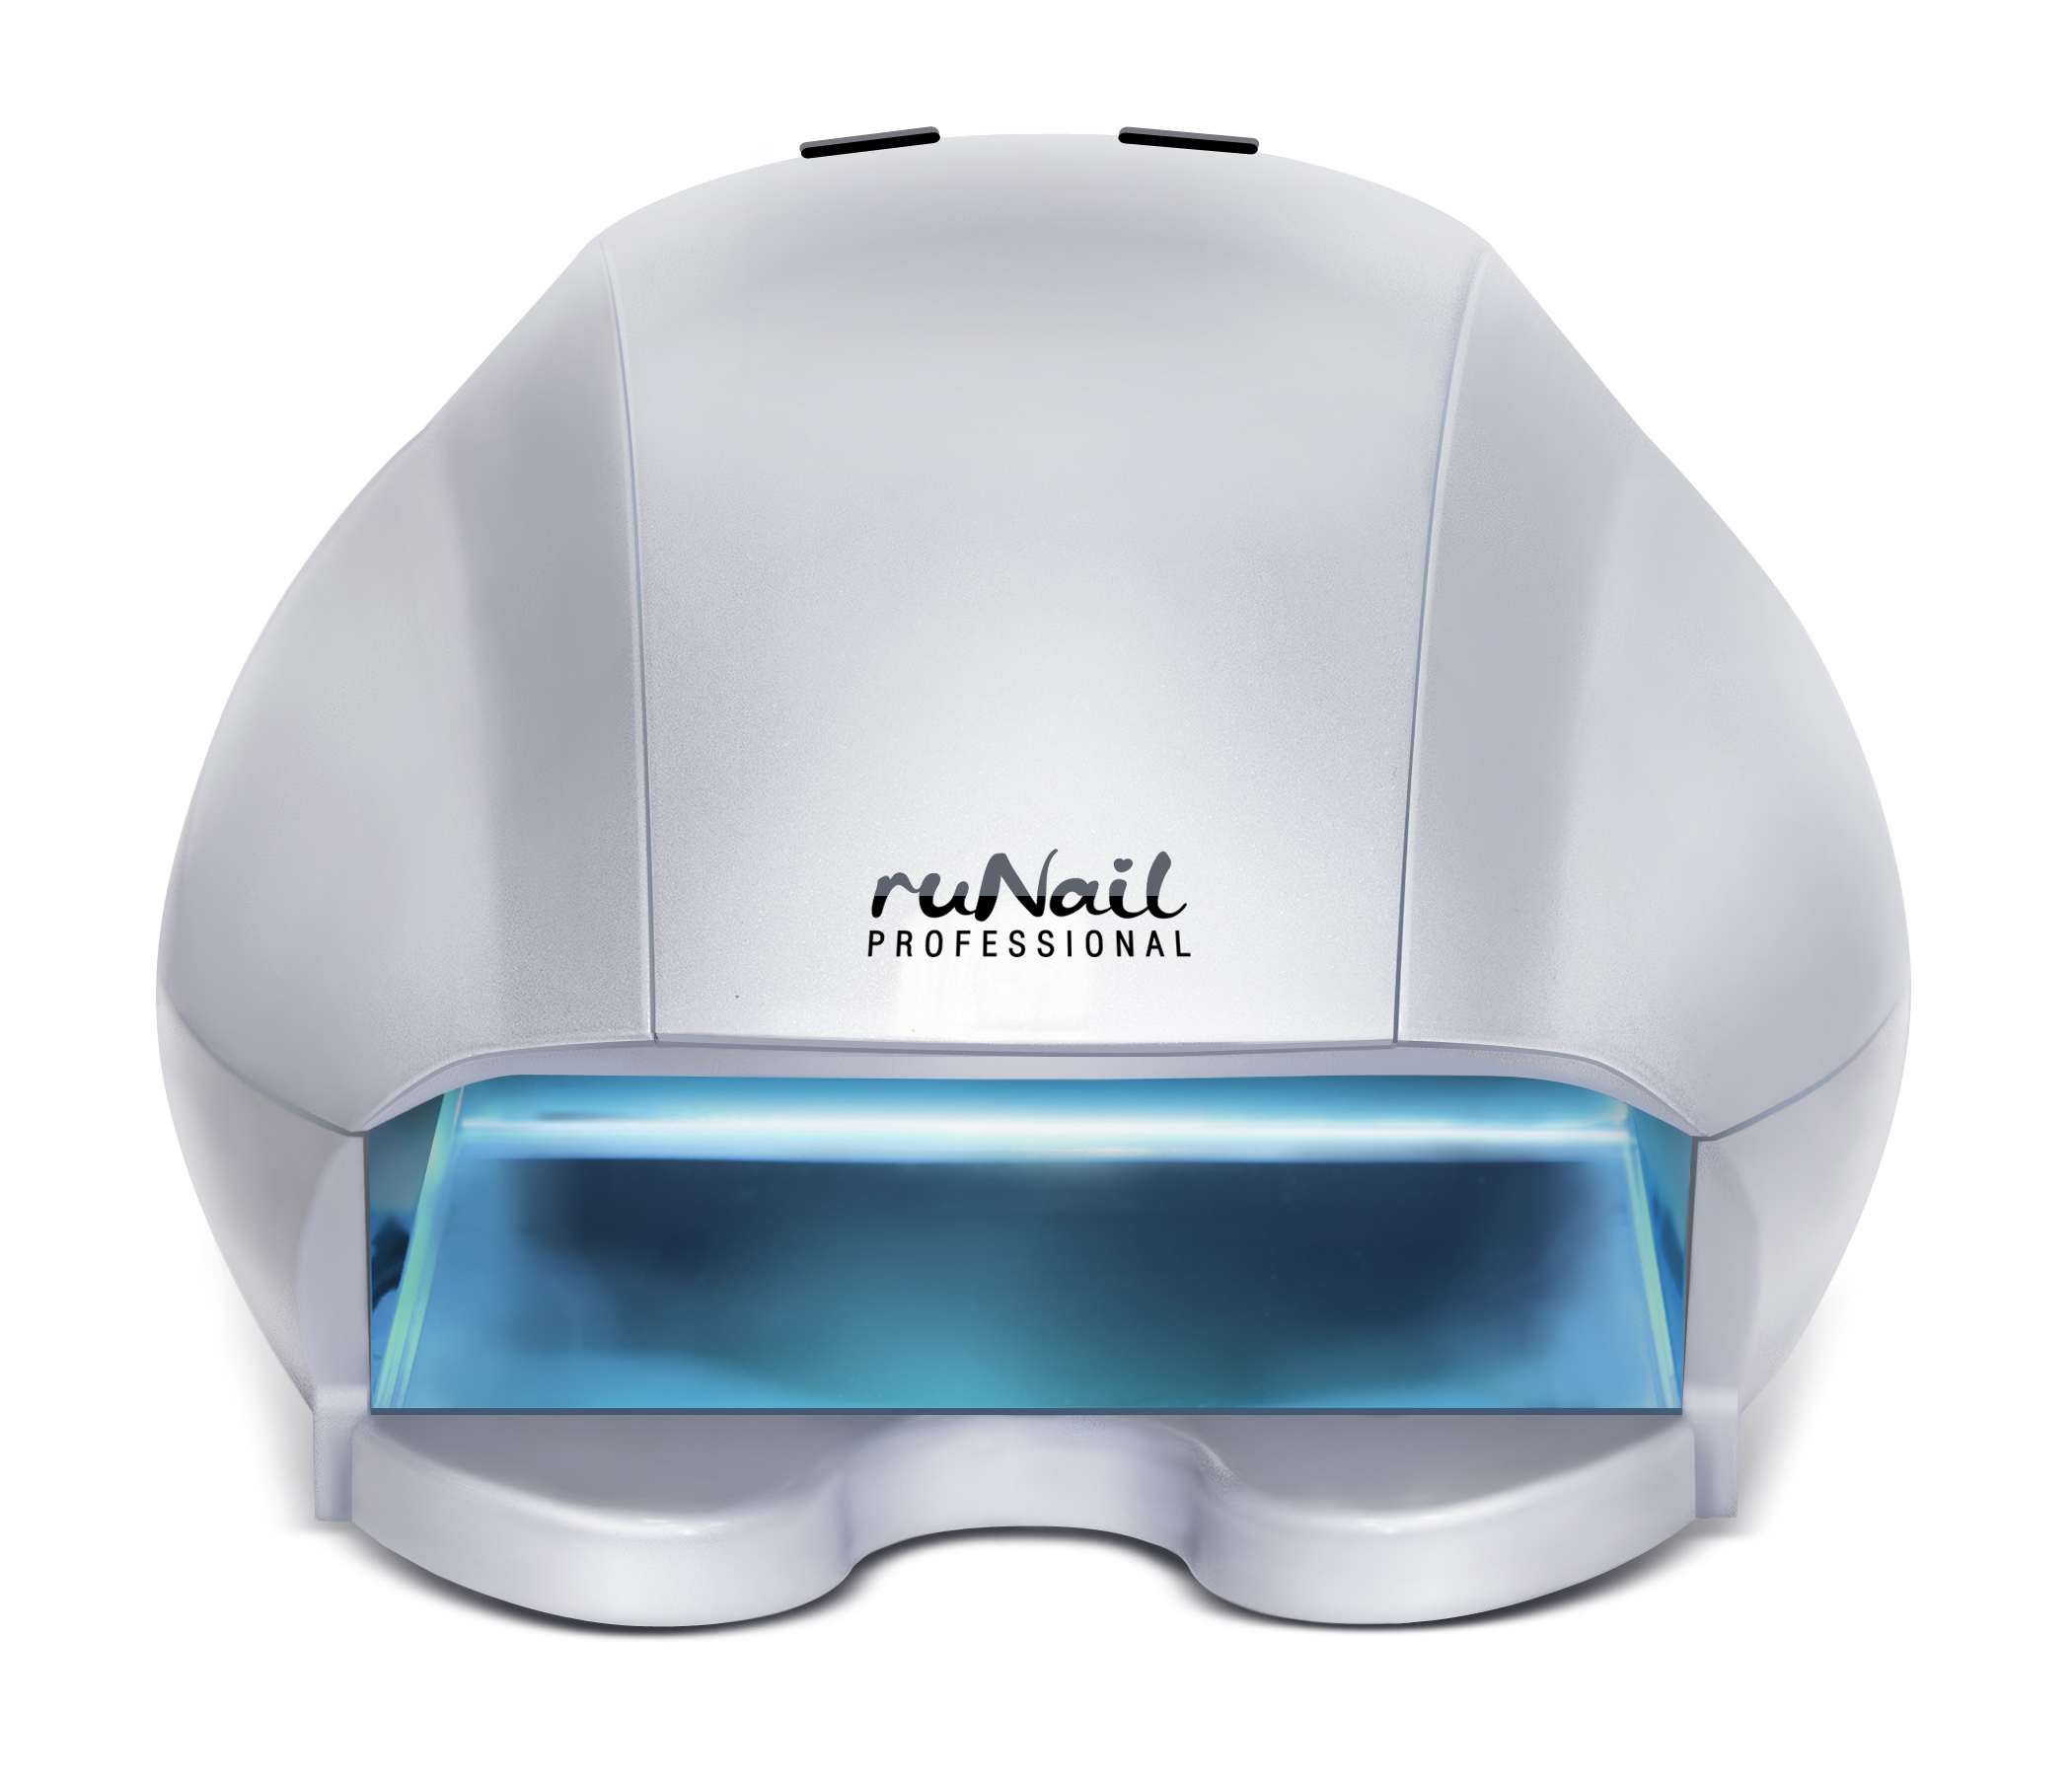 RuNail Лампа UV-LED 12 Вт. (серебряная)